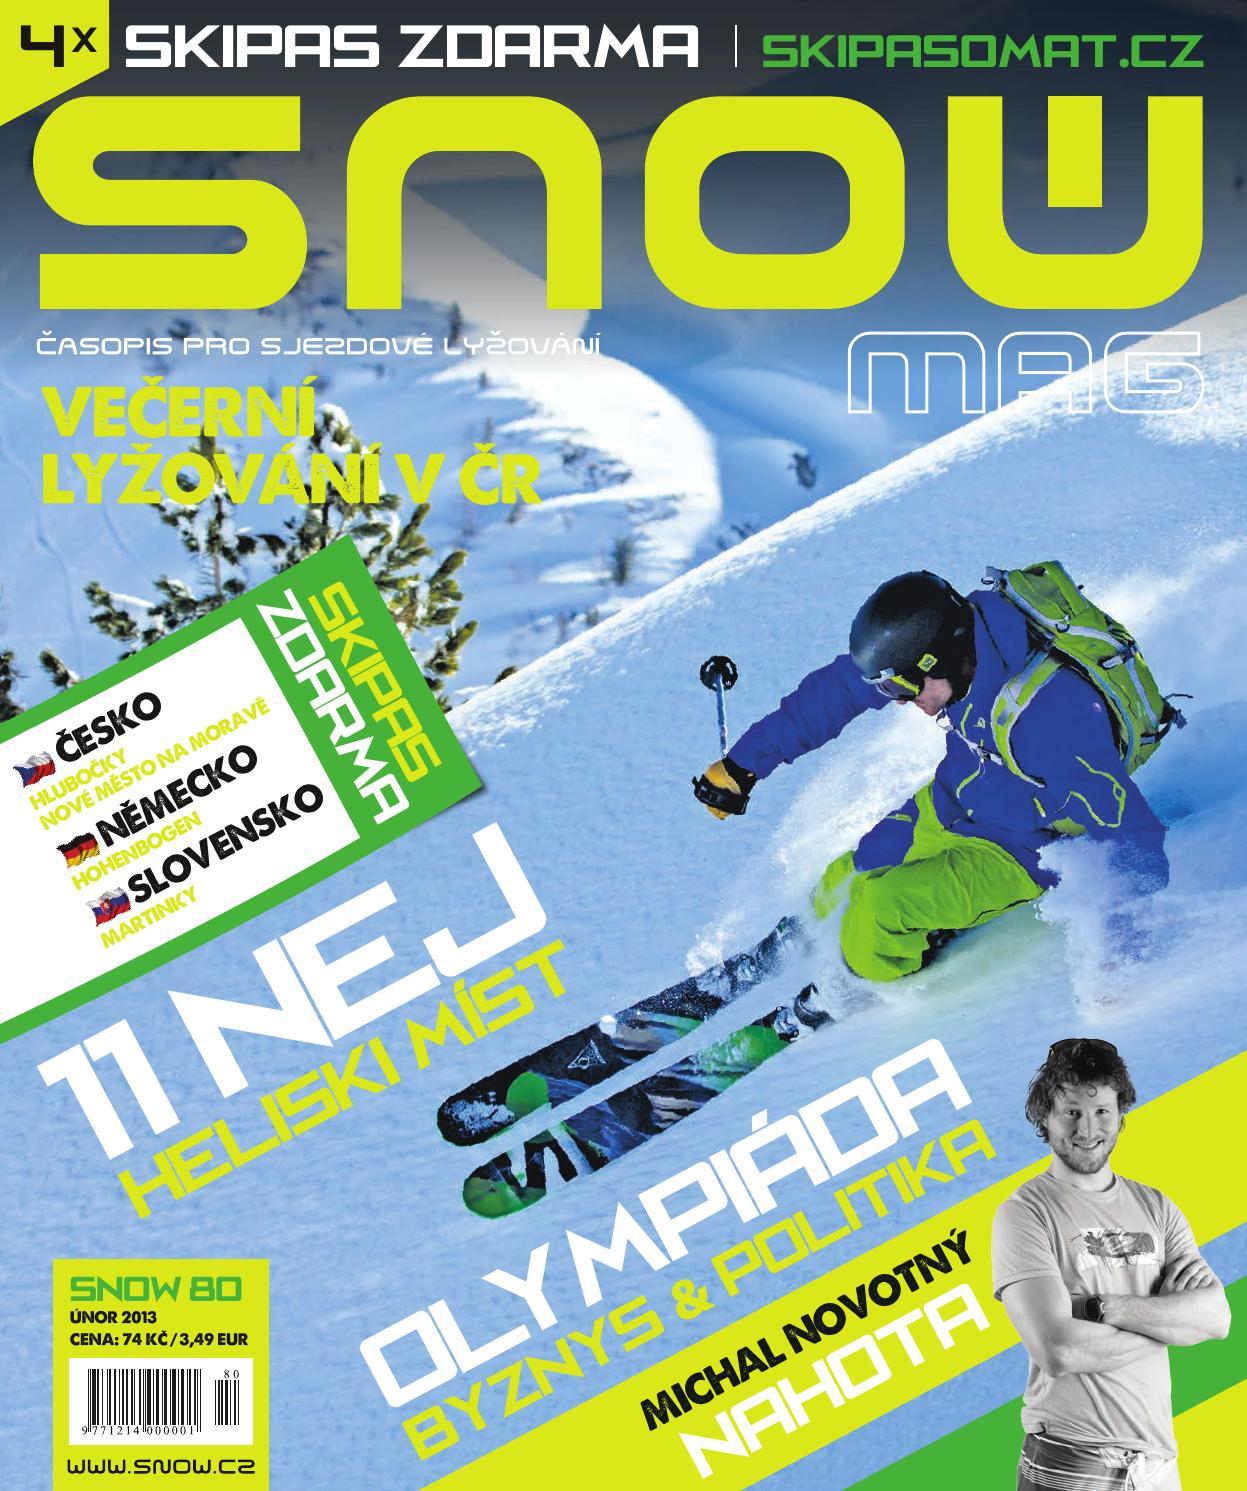 dd1310d5314 SNOW 80 - únor 2014 by SNOW CZ s.r.o. - issuu